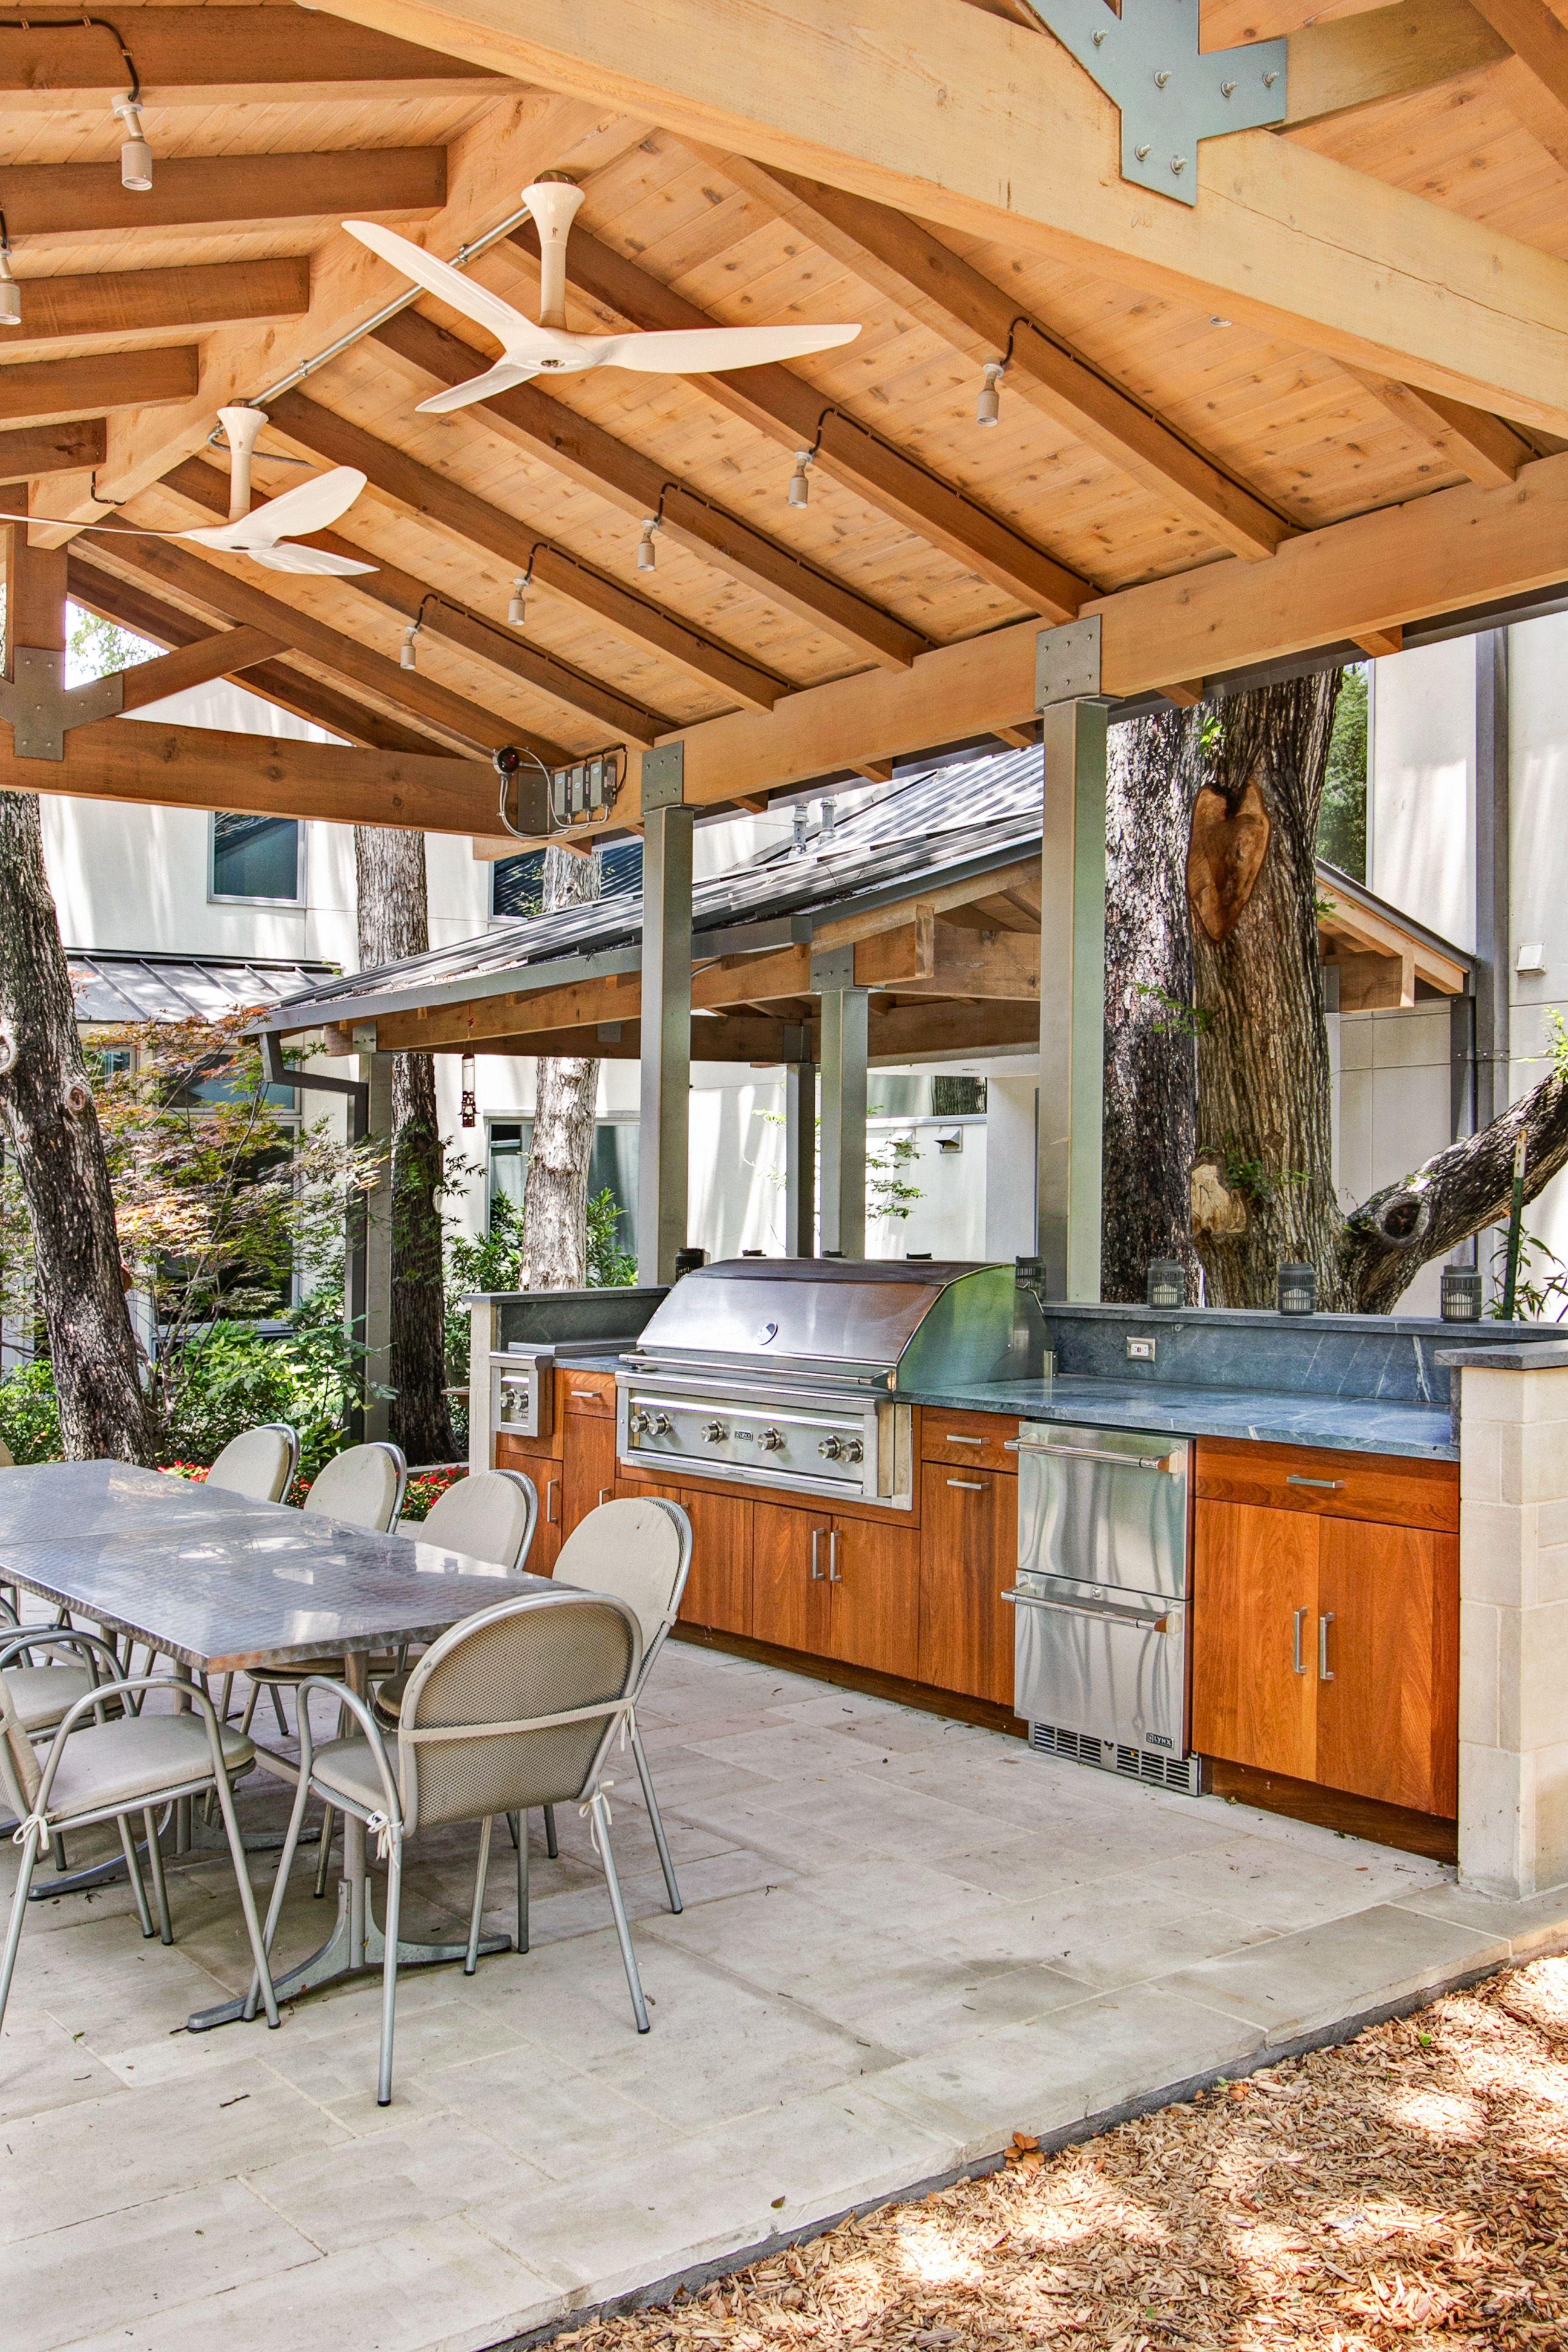 Teak Cabinets With Slab Door Lynx 54 Grill Double Side Burner And Drawer Fri Outdoor Kitchen Design Layout Covered Outdoor Kitchens Outdoor Kitchen Design